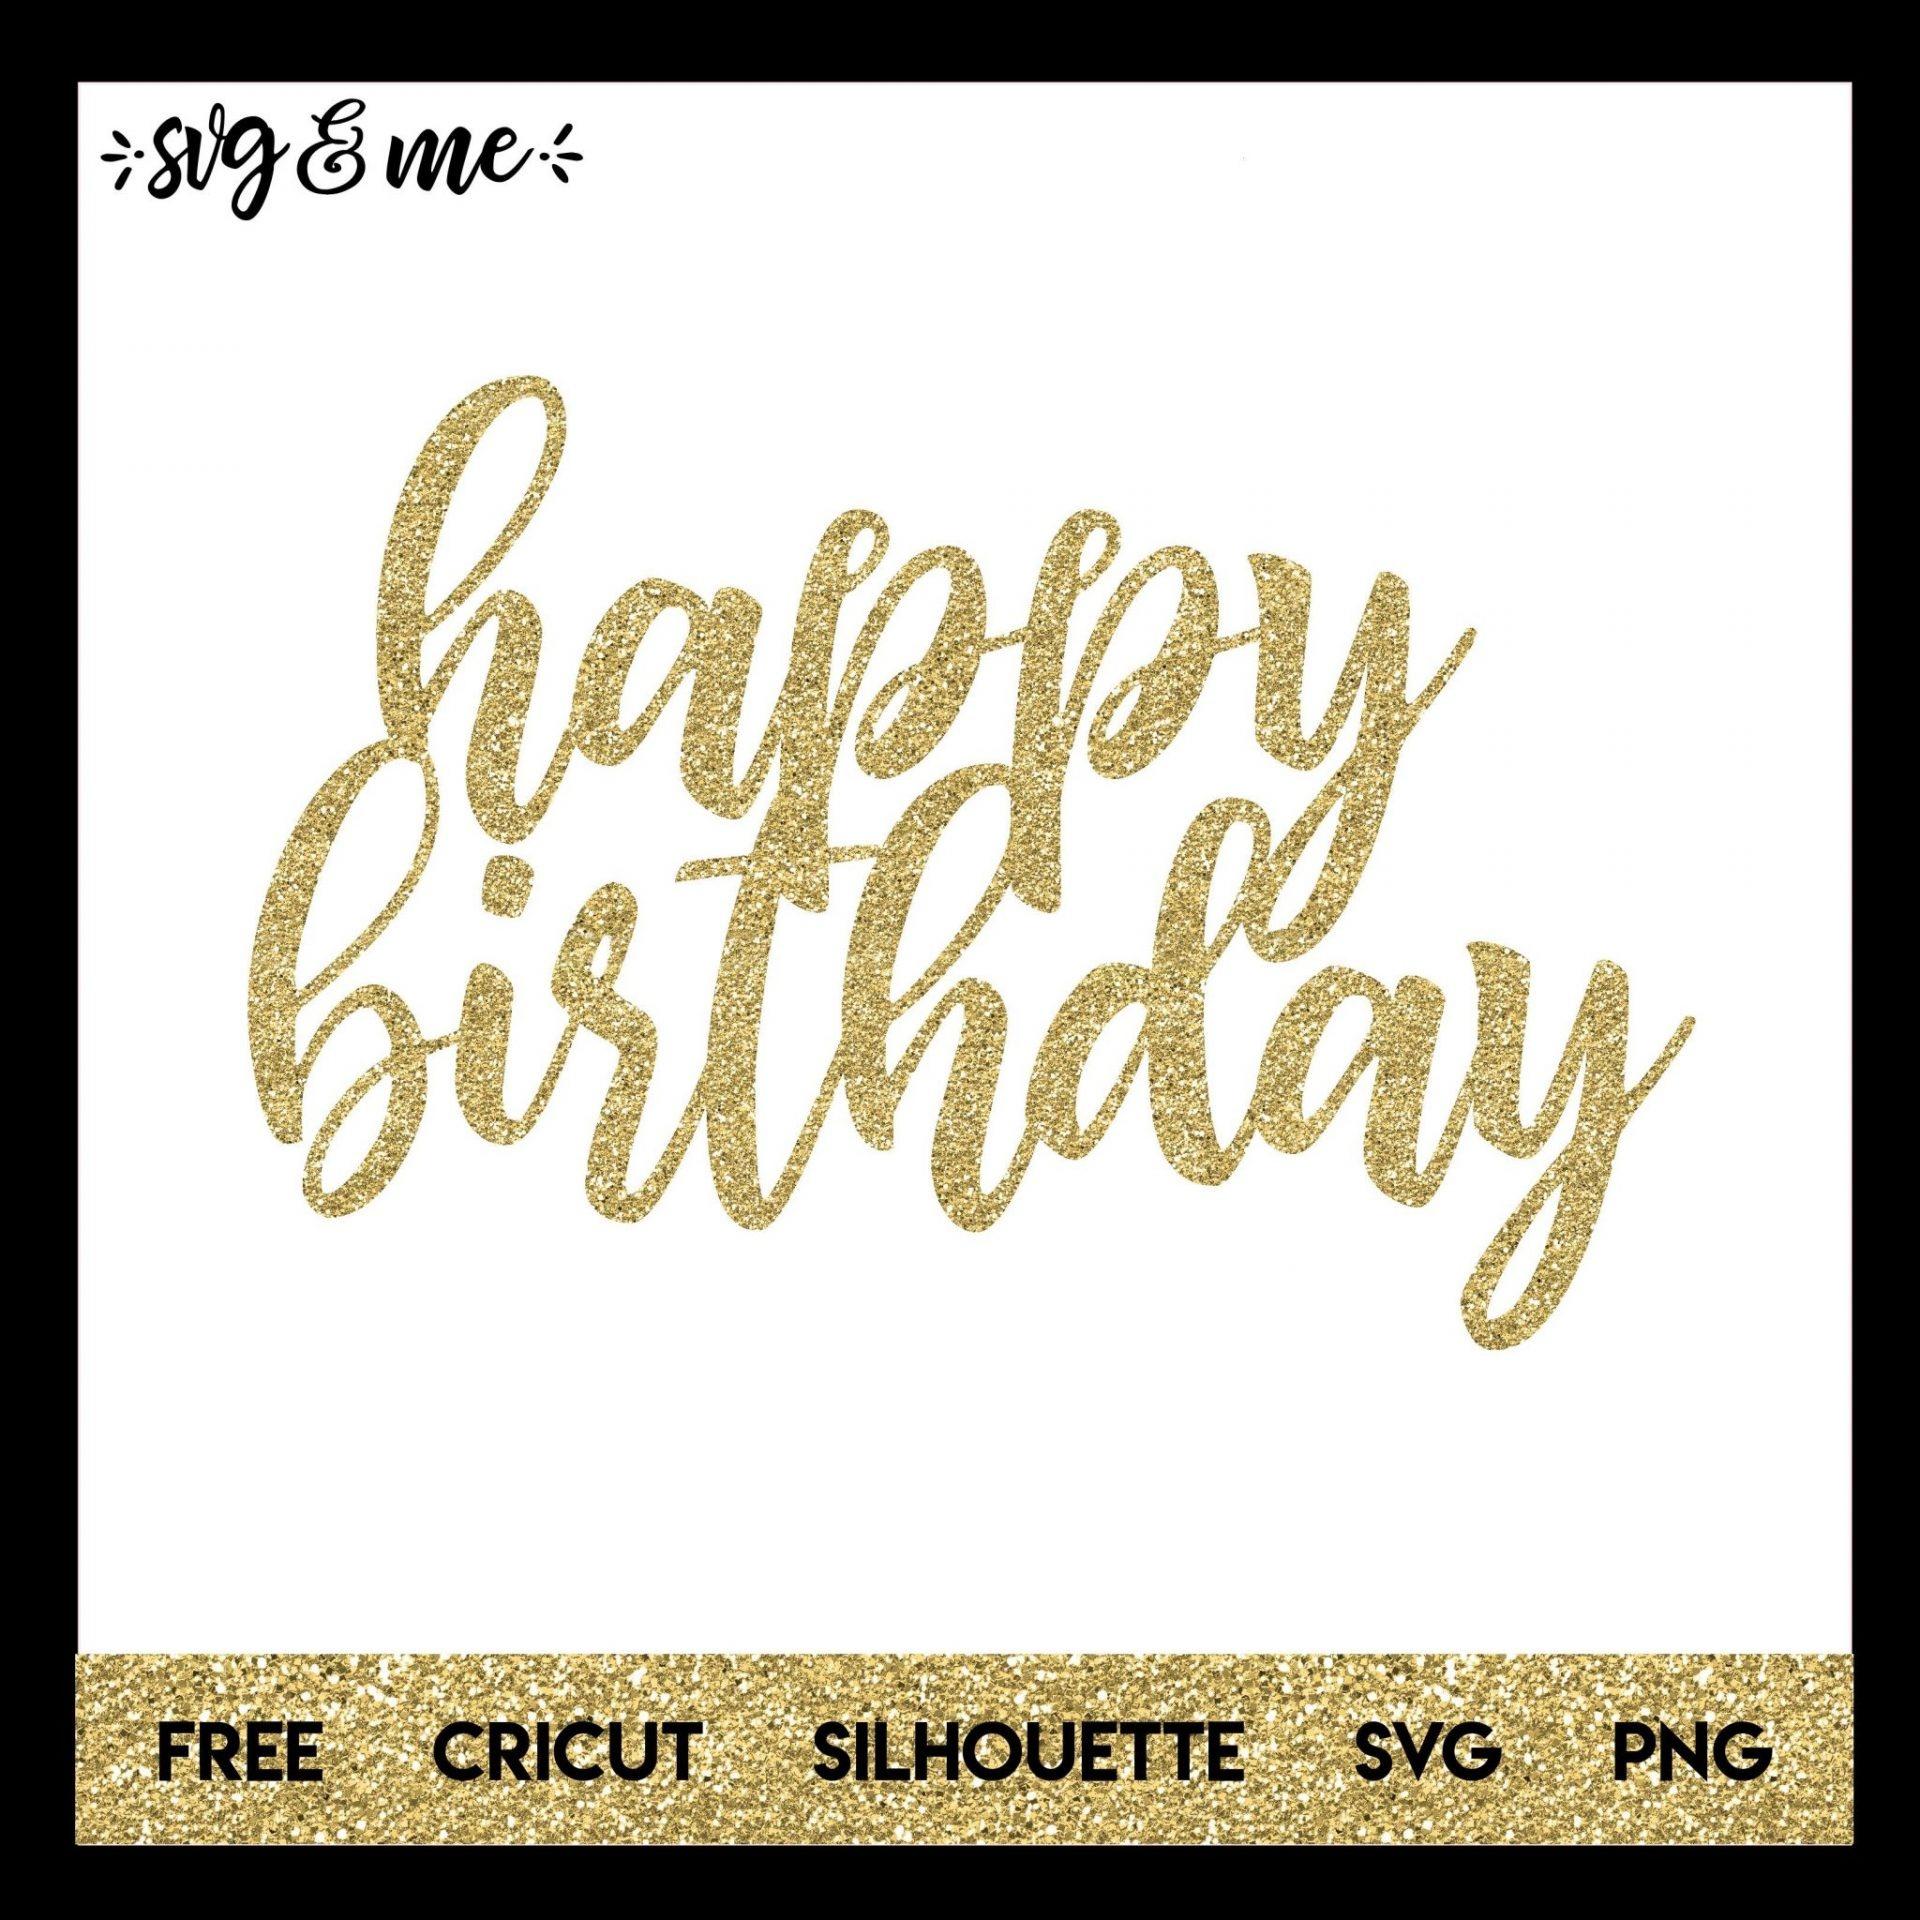 Happy Birthday Cake Topper - Svg & Me - Free Printable Happy Birthday Cake Topper